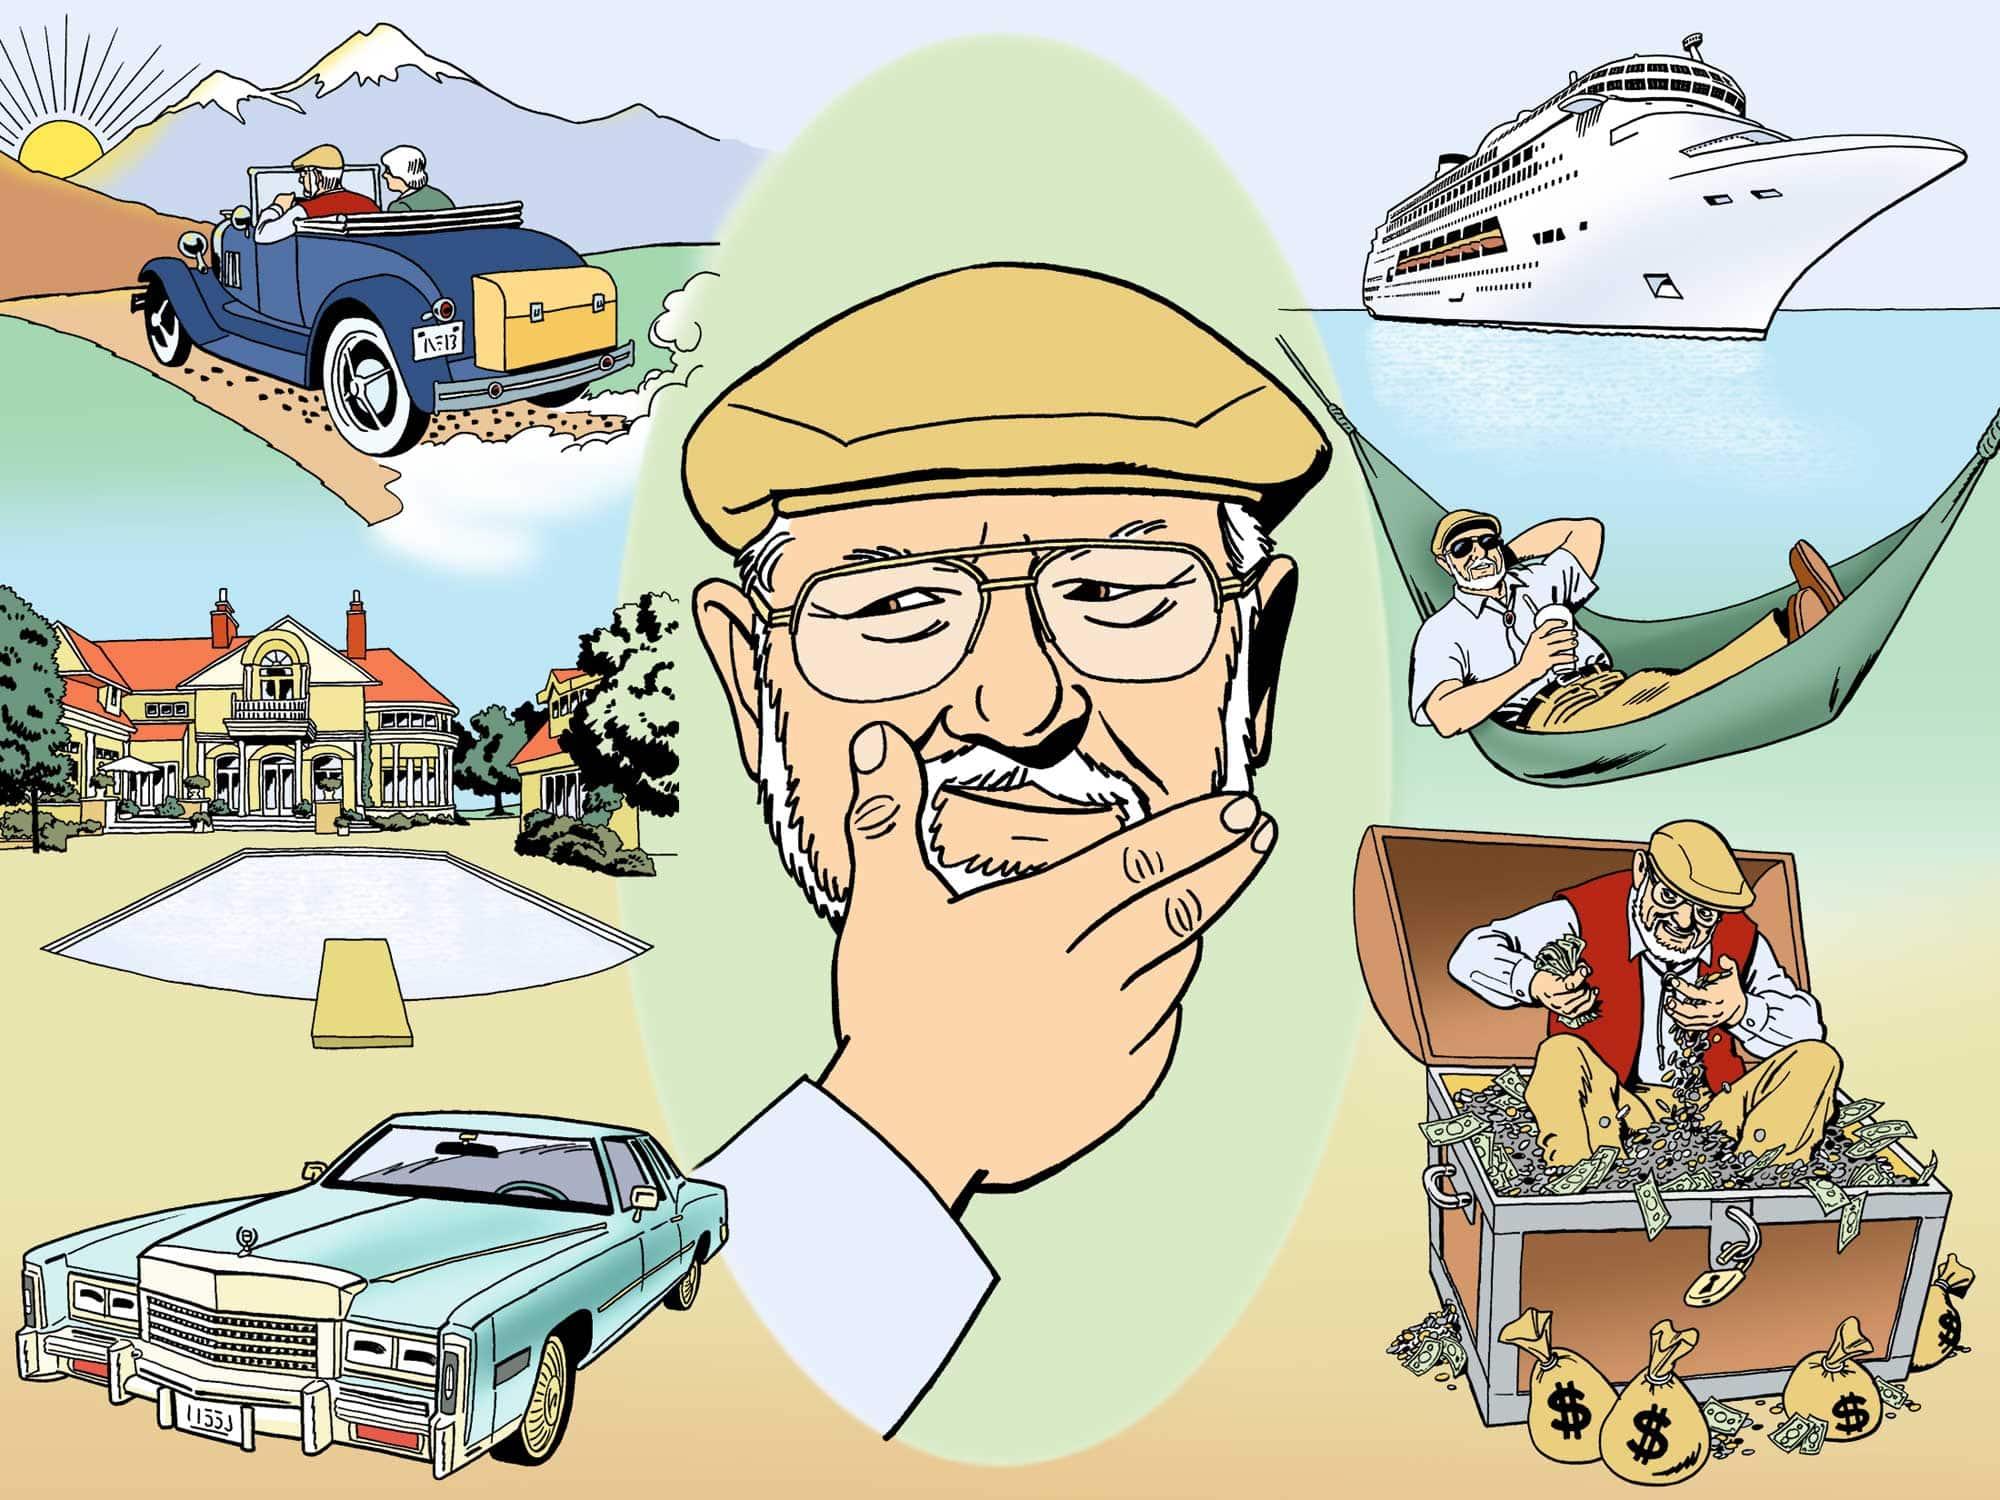 KH3314B-mansion-cars-liner-treasure